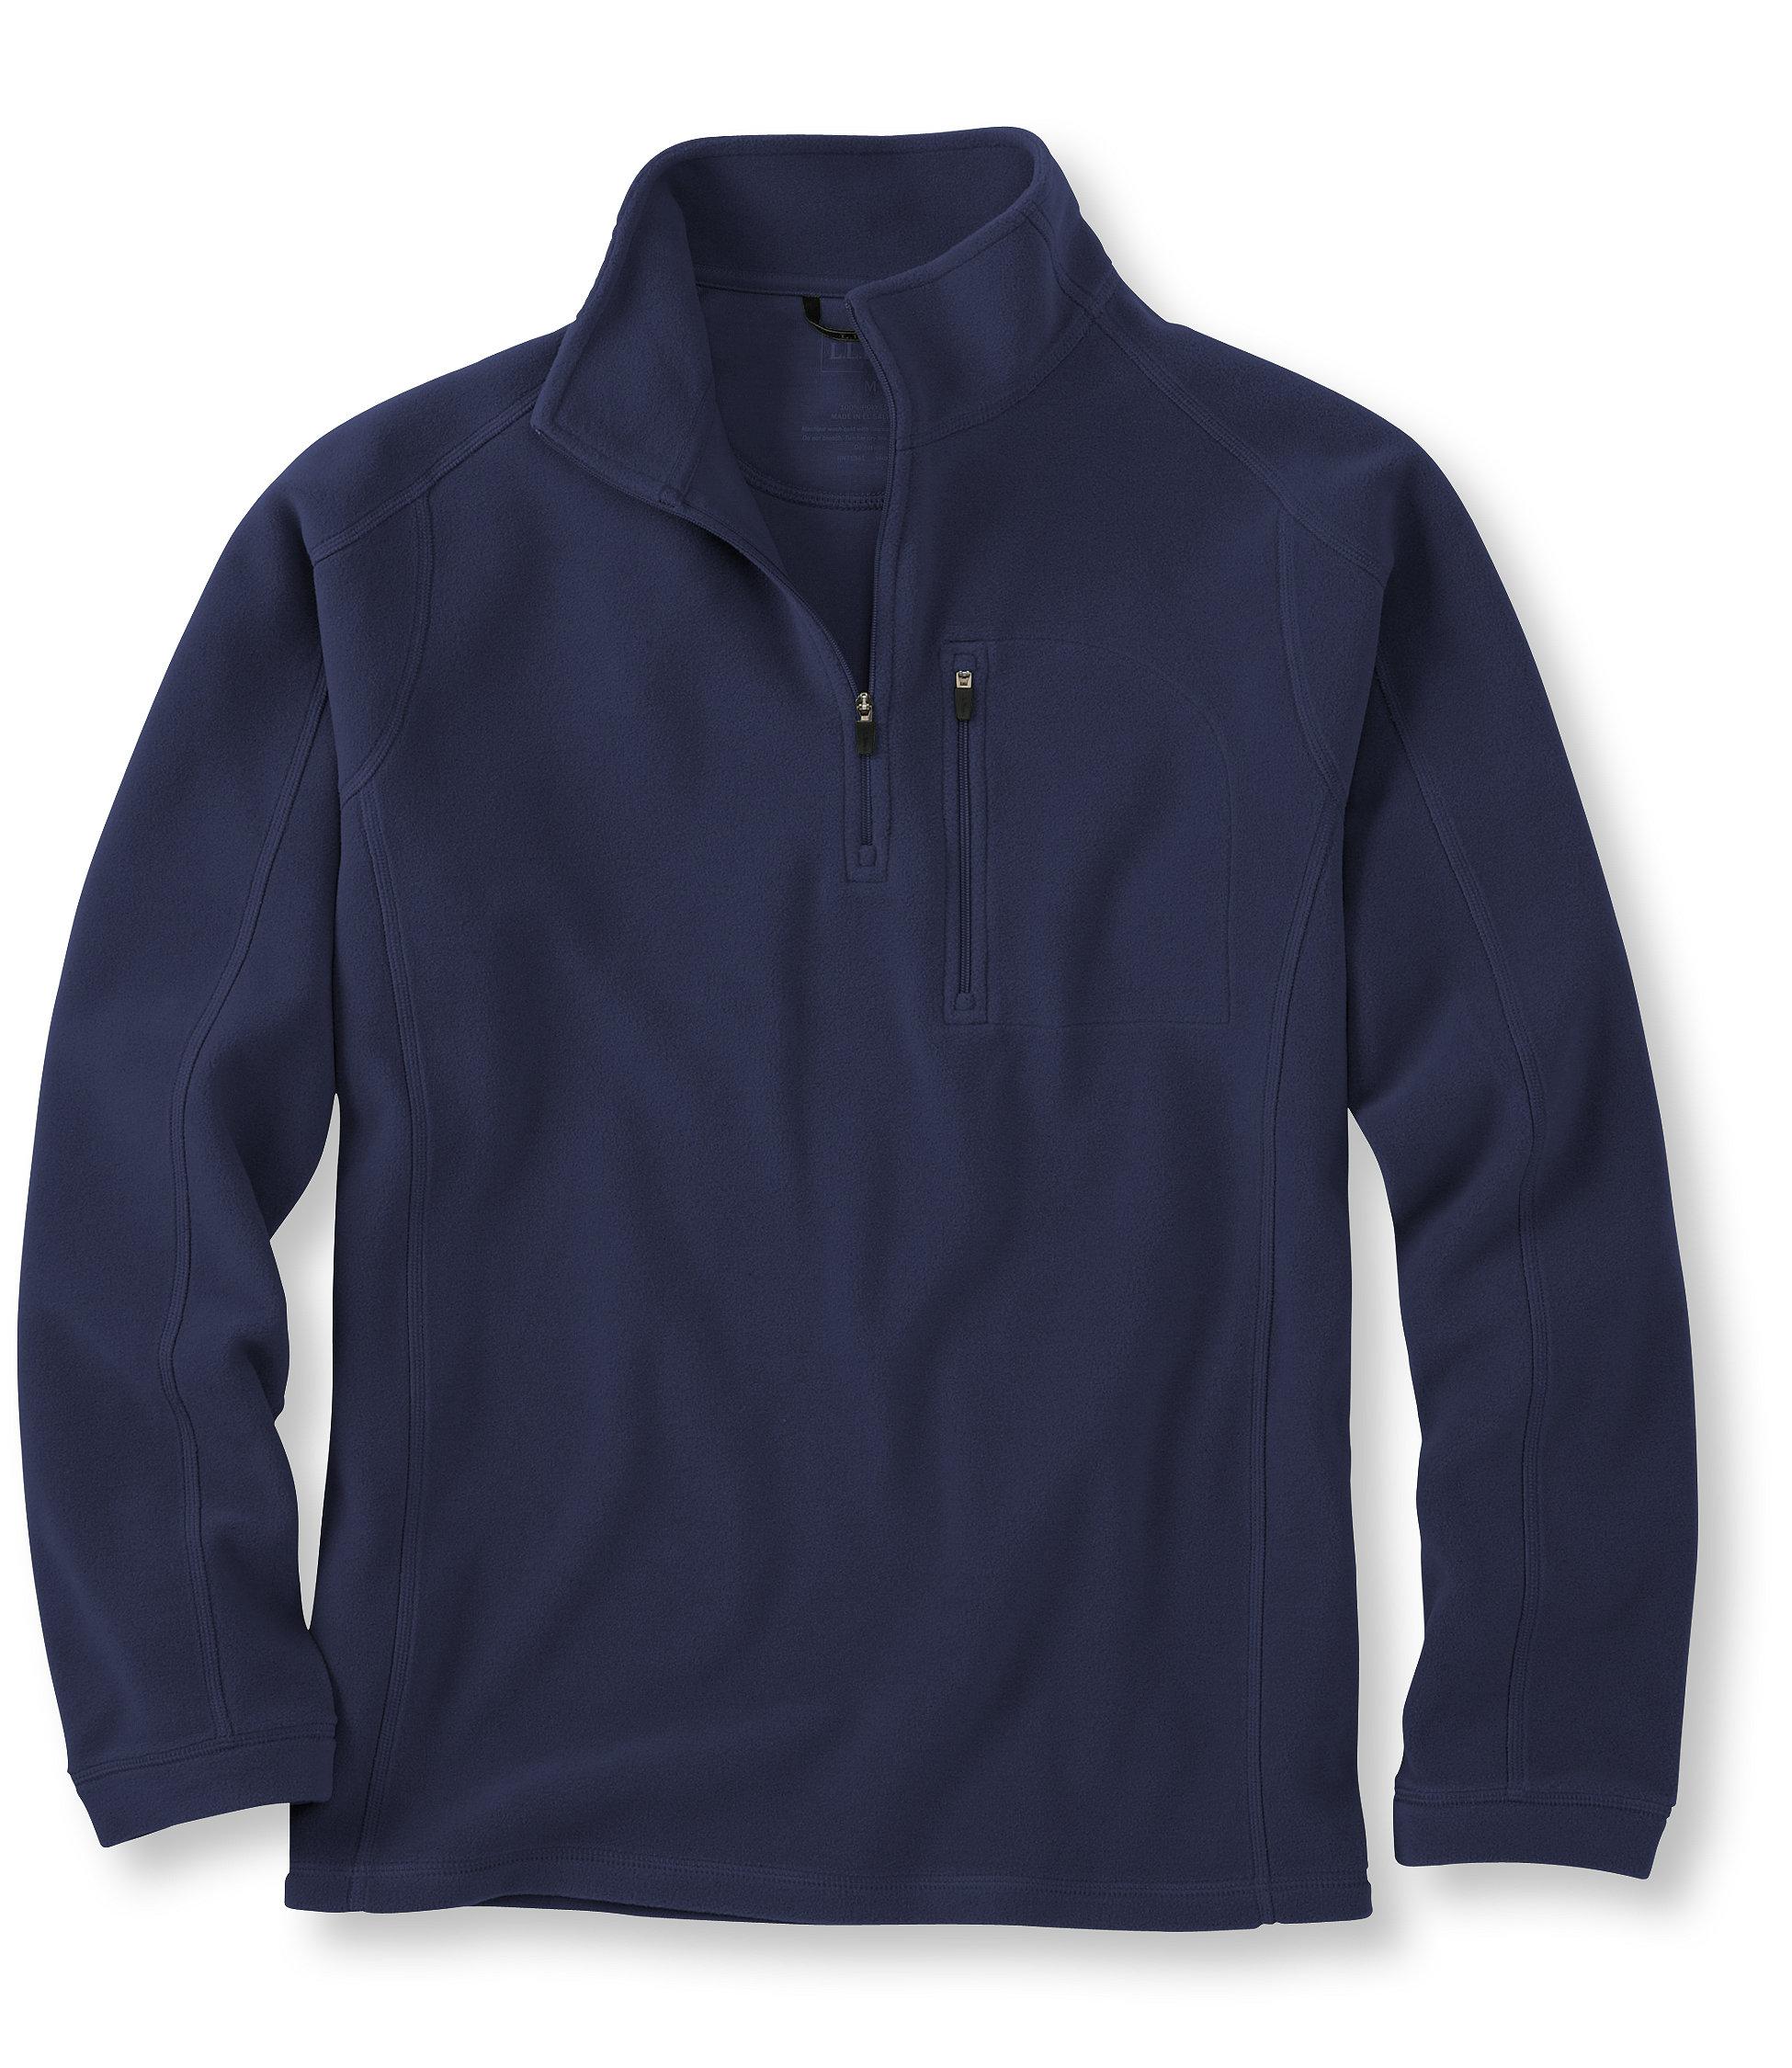 L.L.Bean Quarter-Zip Fitness Fleece